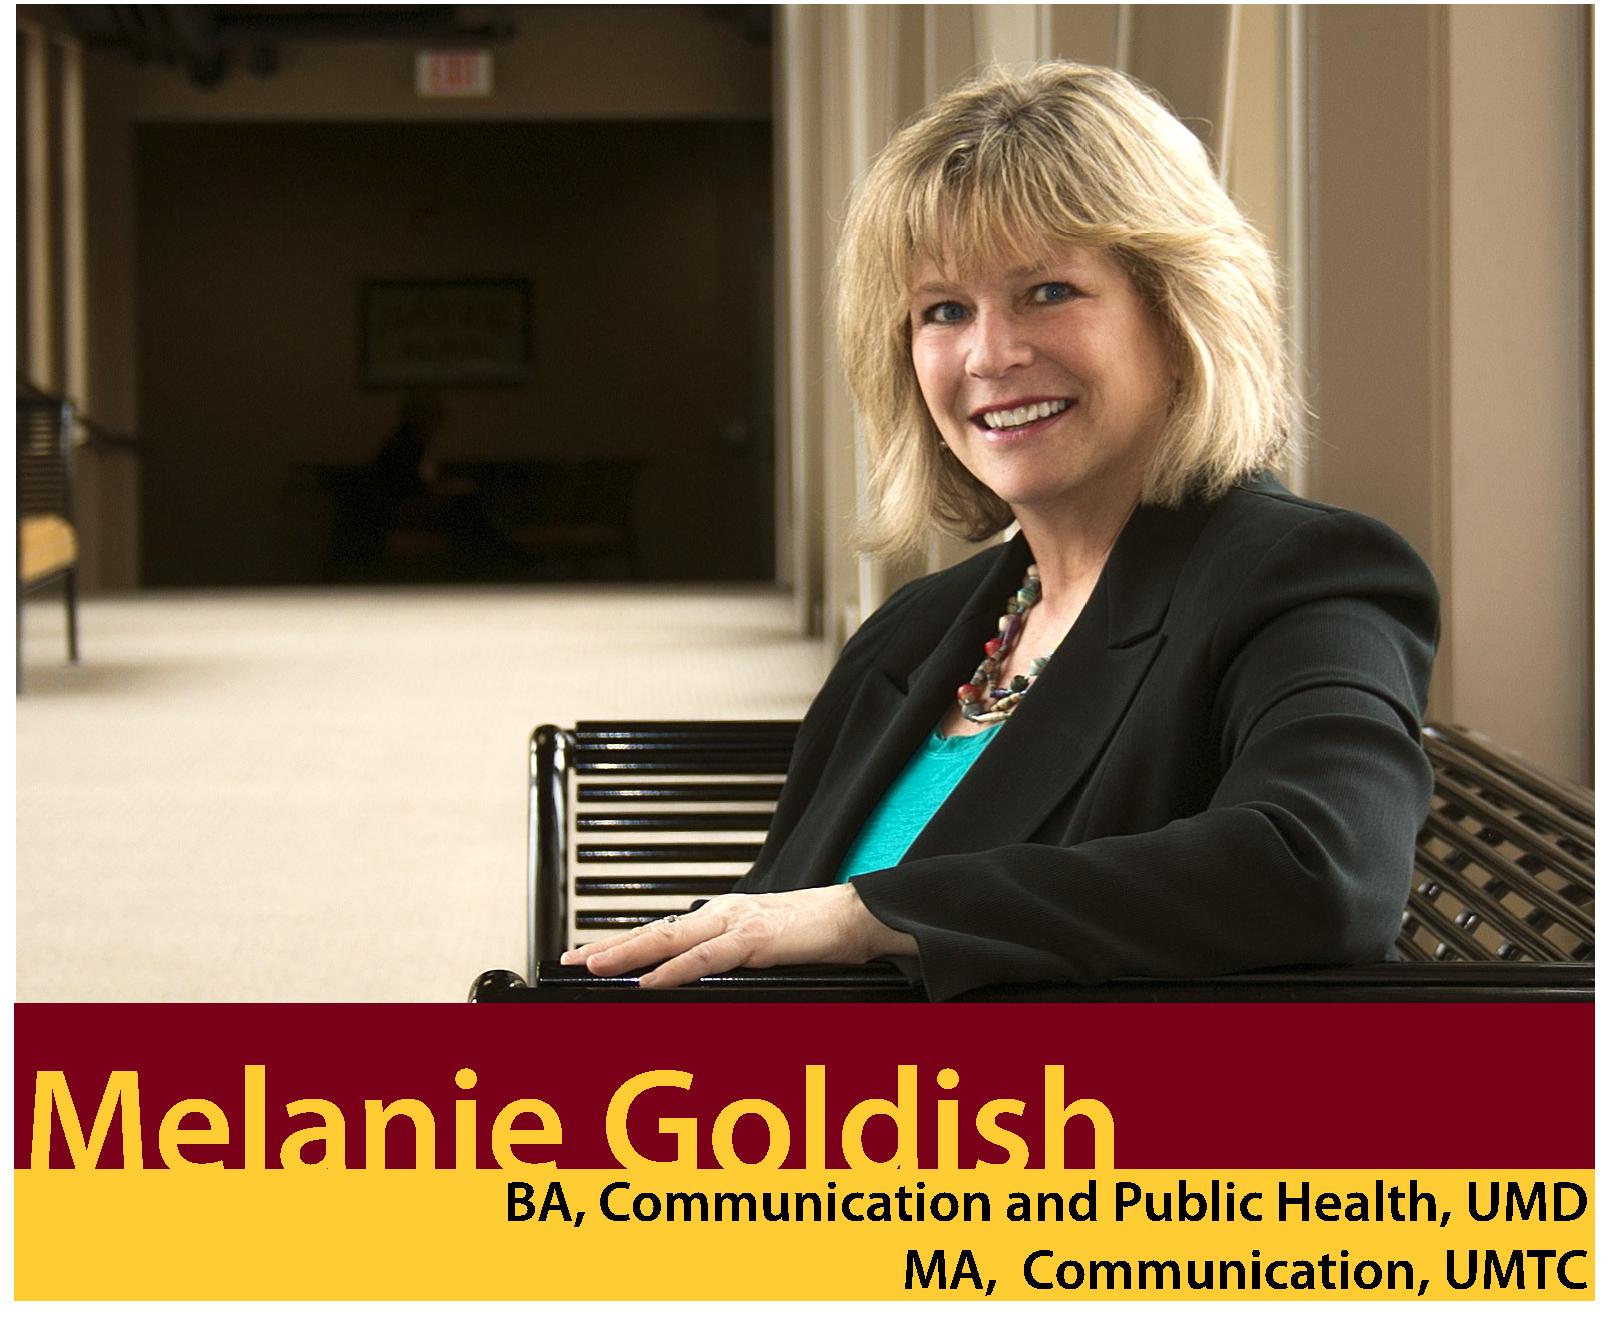 Alumni Photo: Melanie Goldish